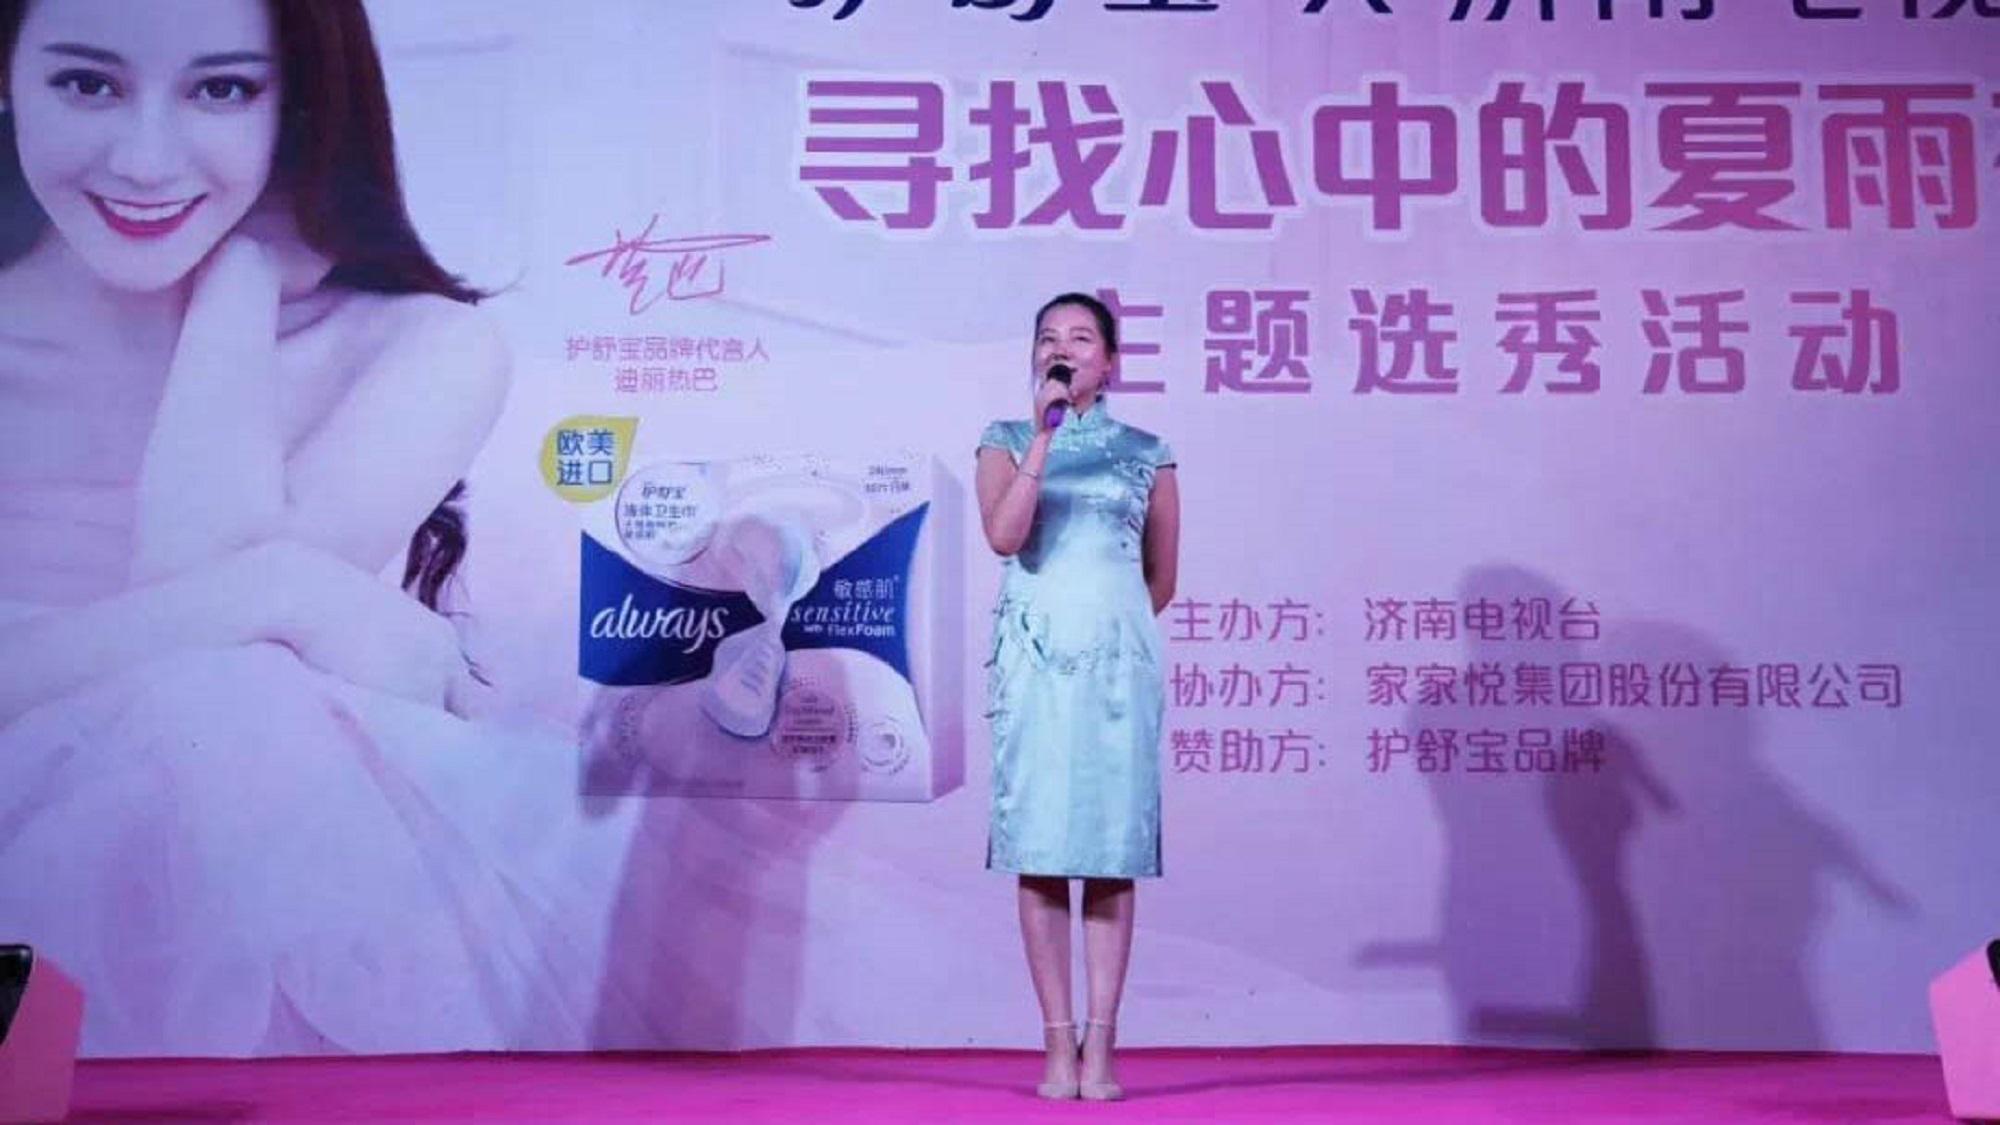 Xiayuhe Talent Show at SPAR store 02